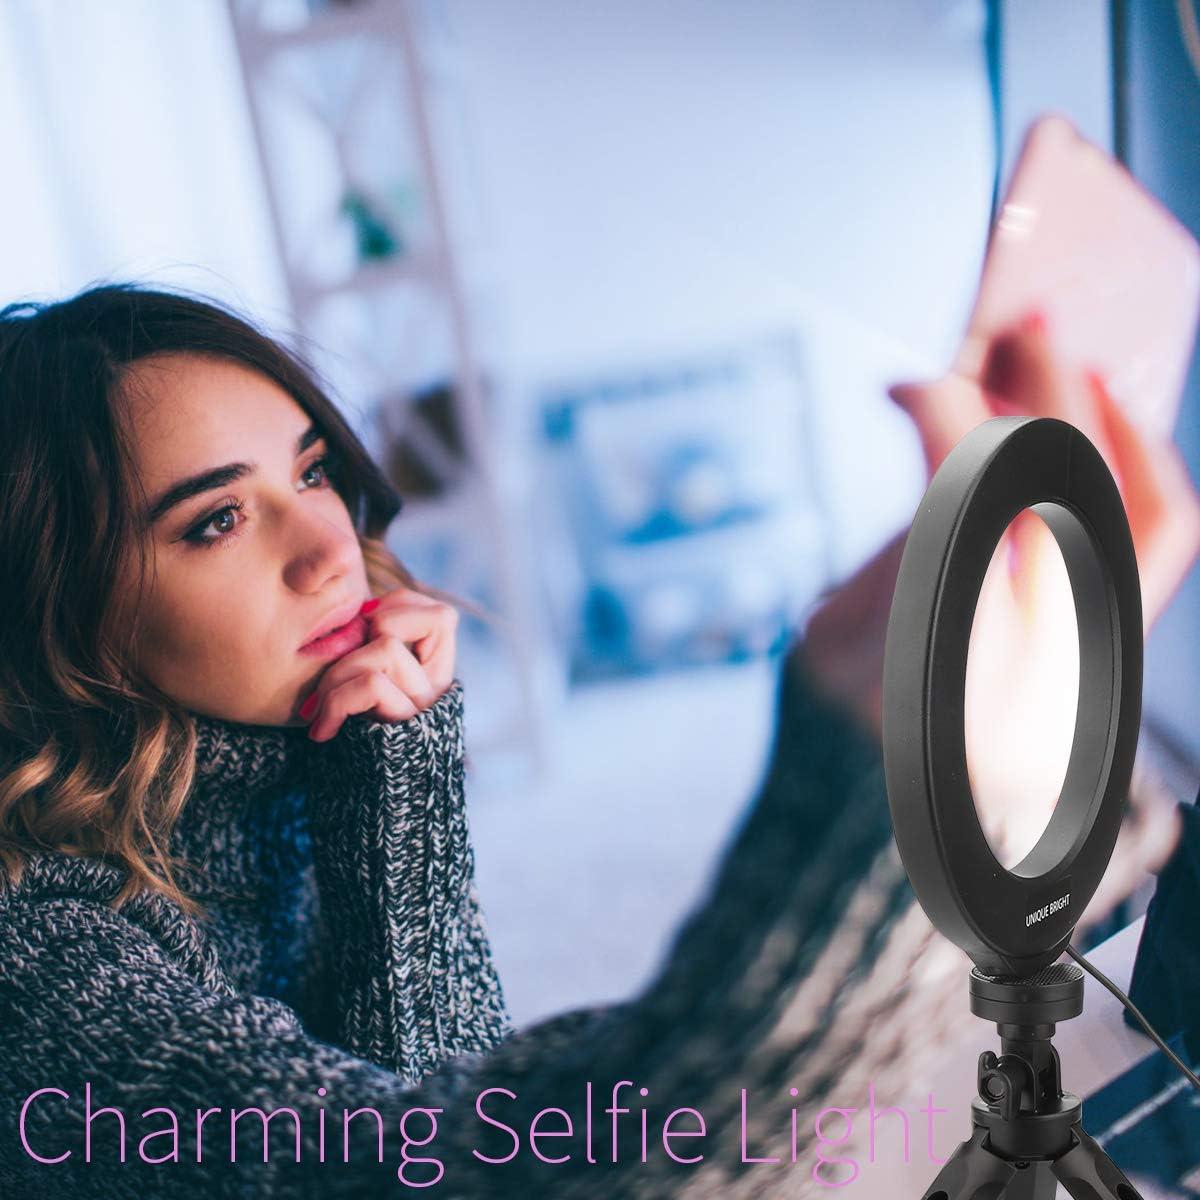 Beauty LED Ringlicht Dimmbar Selfie Light Kit Makeup Fotografie Beleuchtung Mini Kreis Desktop Lampe Licht mit Cellp Hone Halter f/ür YouTube Videos//Foto//Streaming//Instagram 6